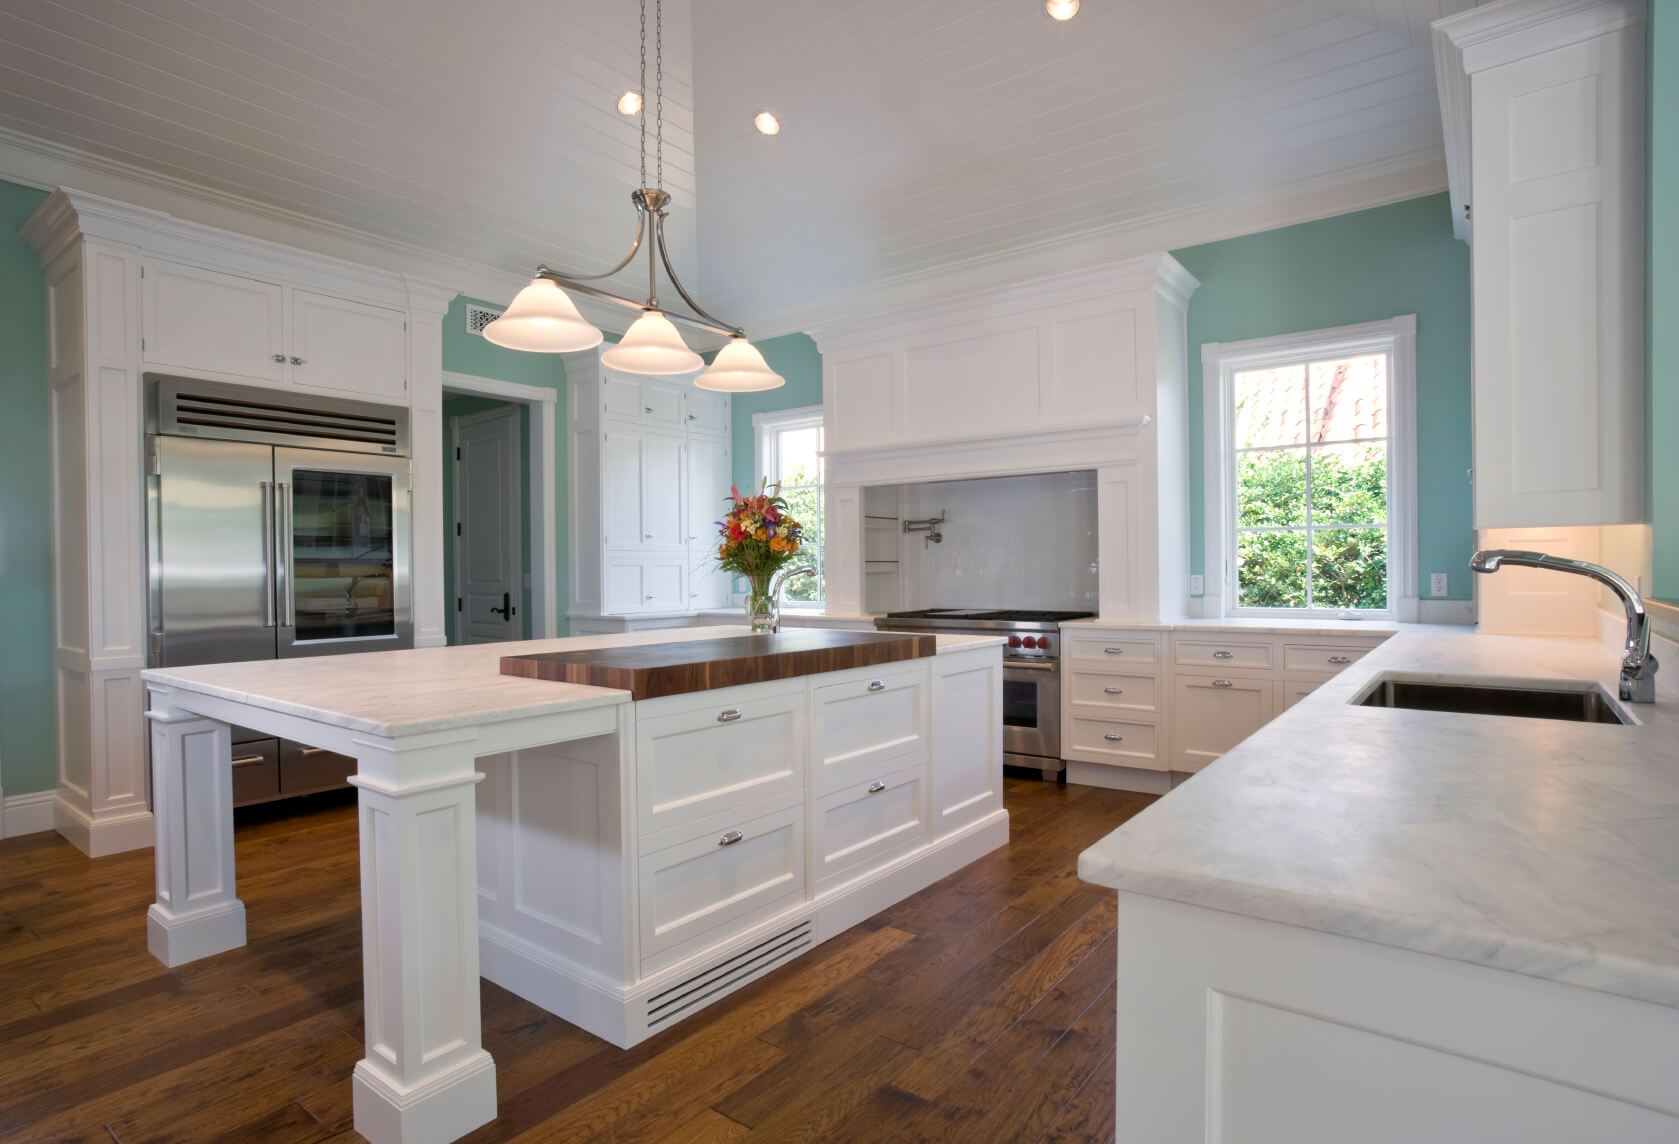 41 White Kitchen Interior Design & Decor Ideas (PICTURES)